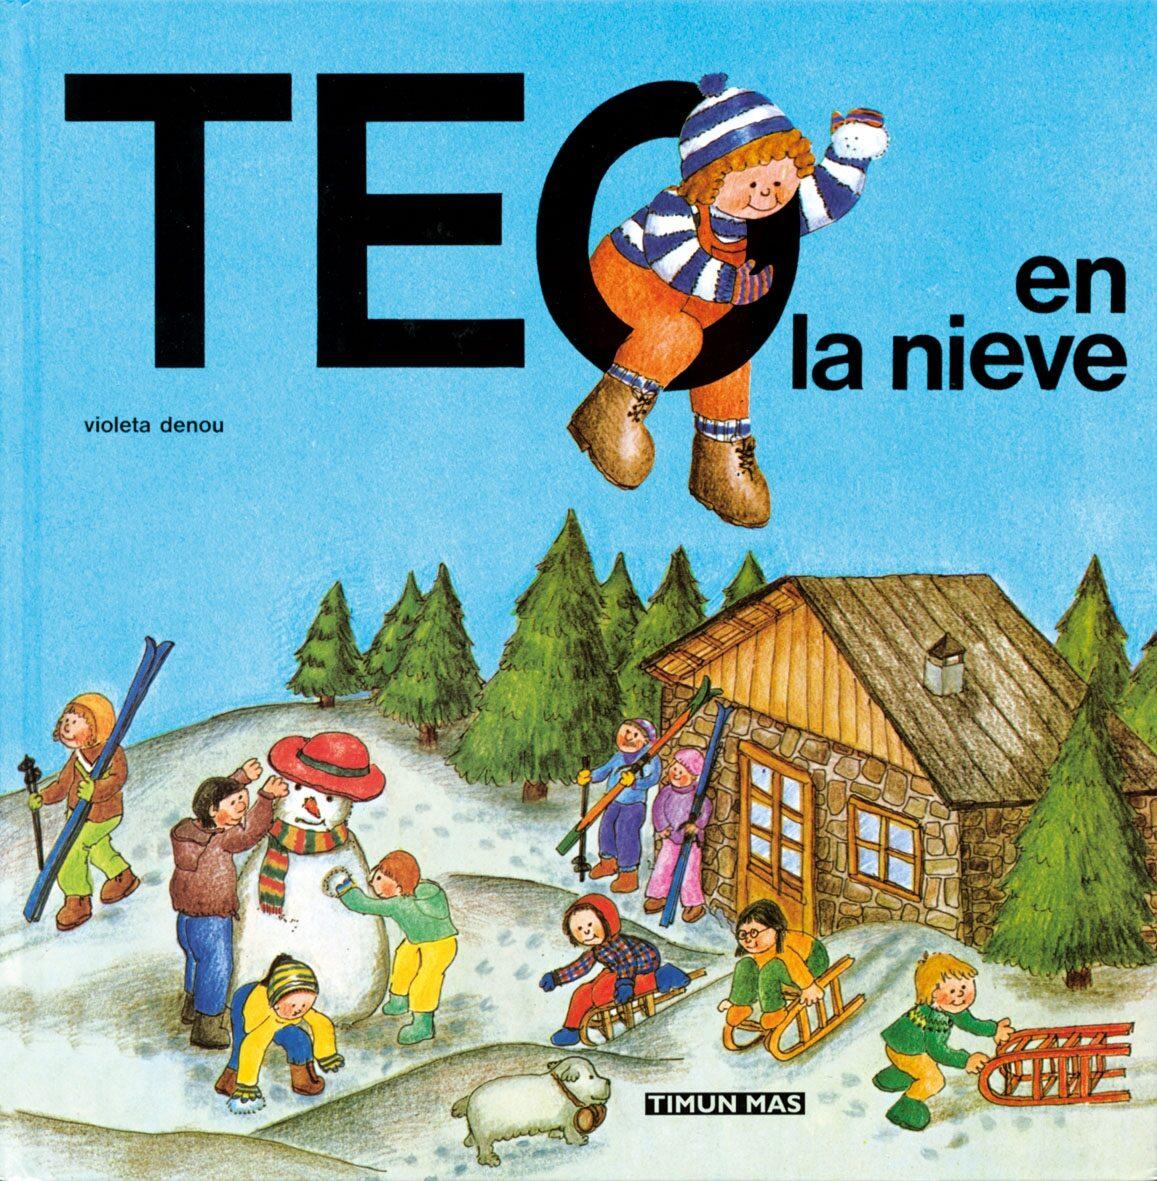 Teo en la nieve violeta denou joan capdevila 9788471763433